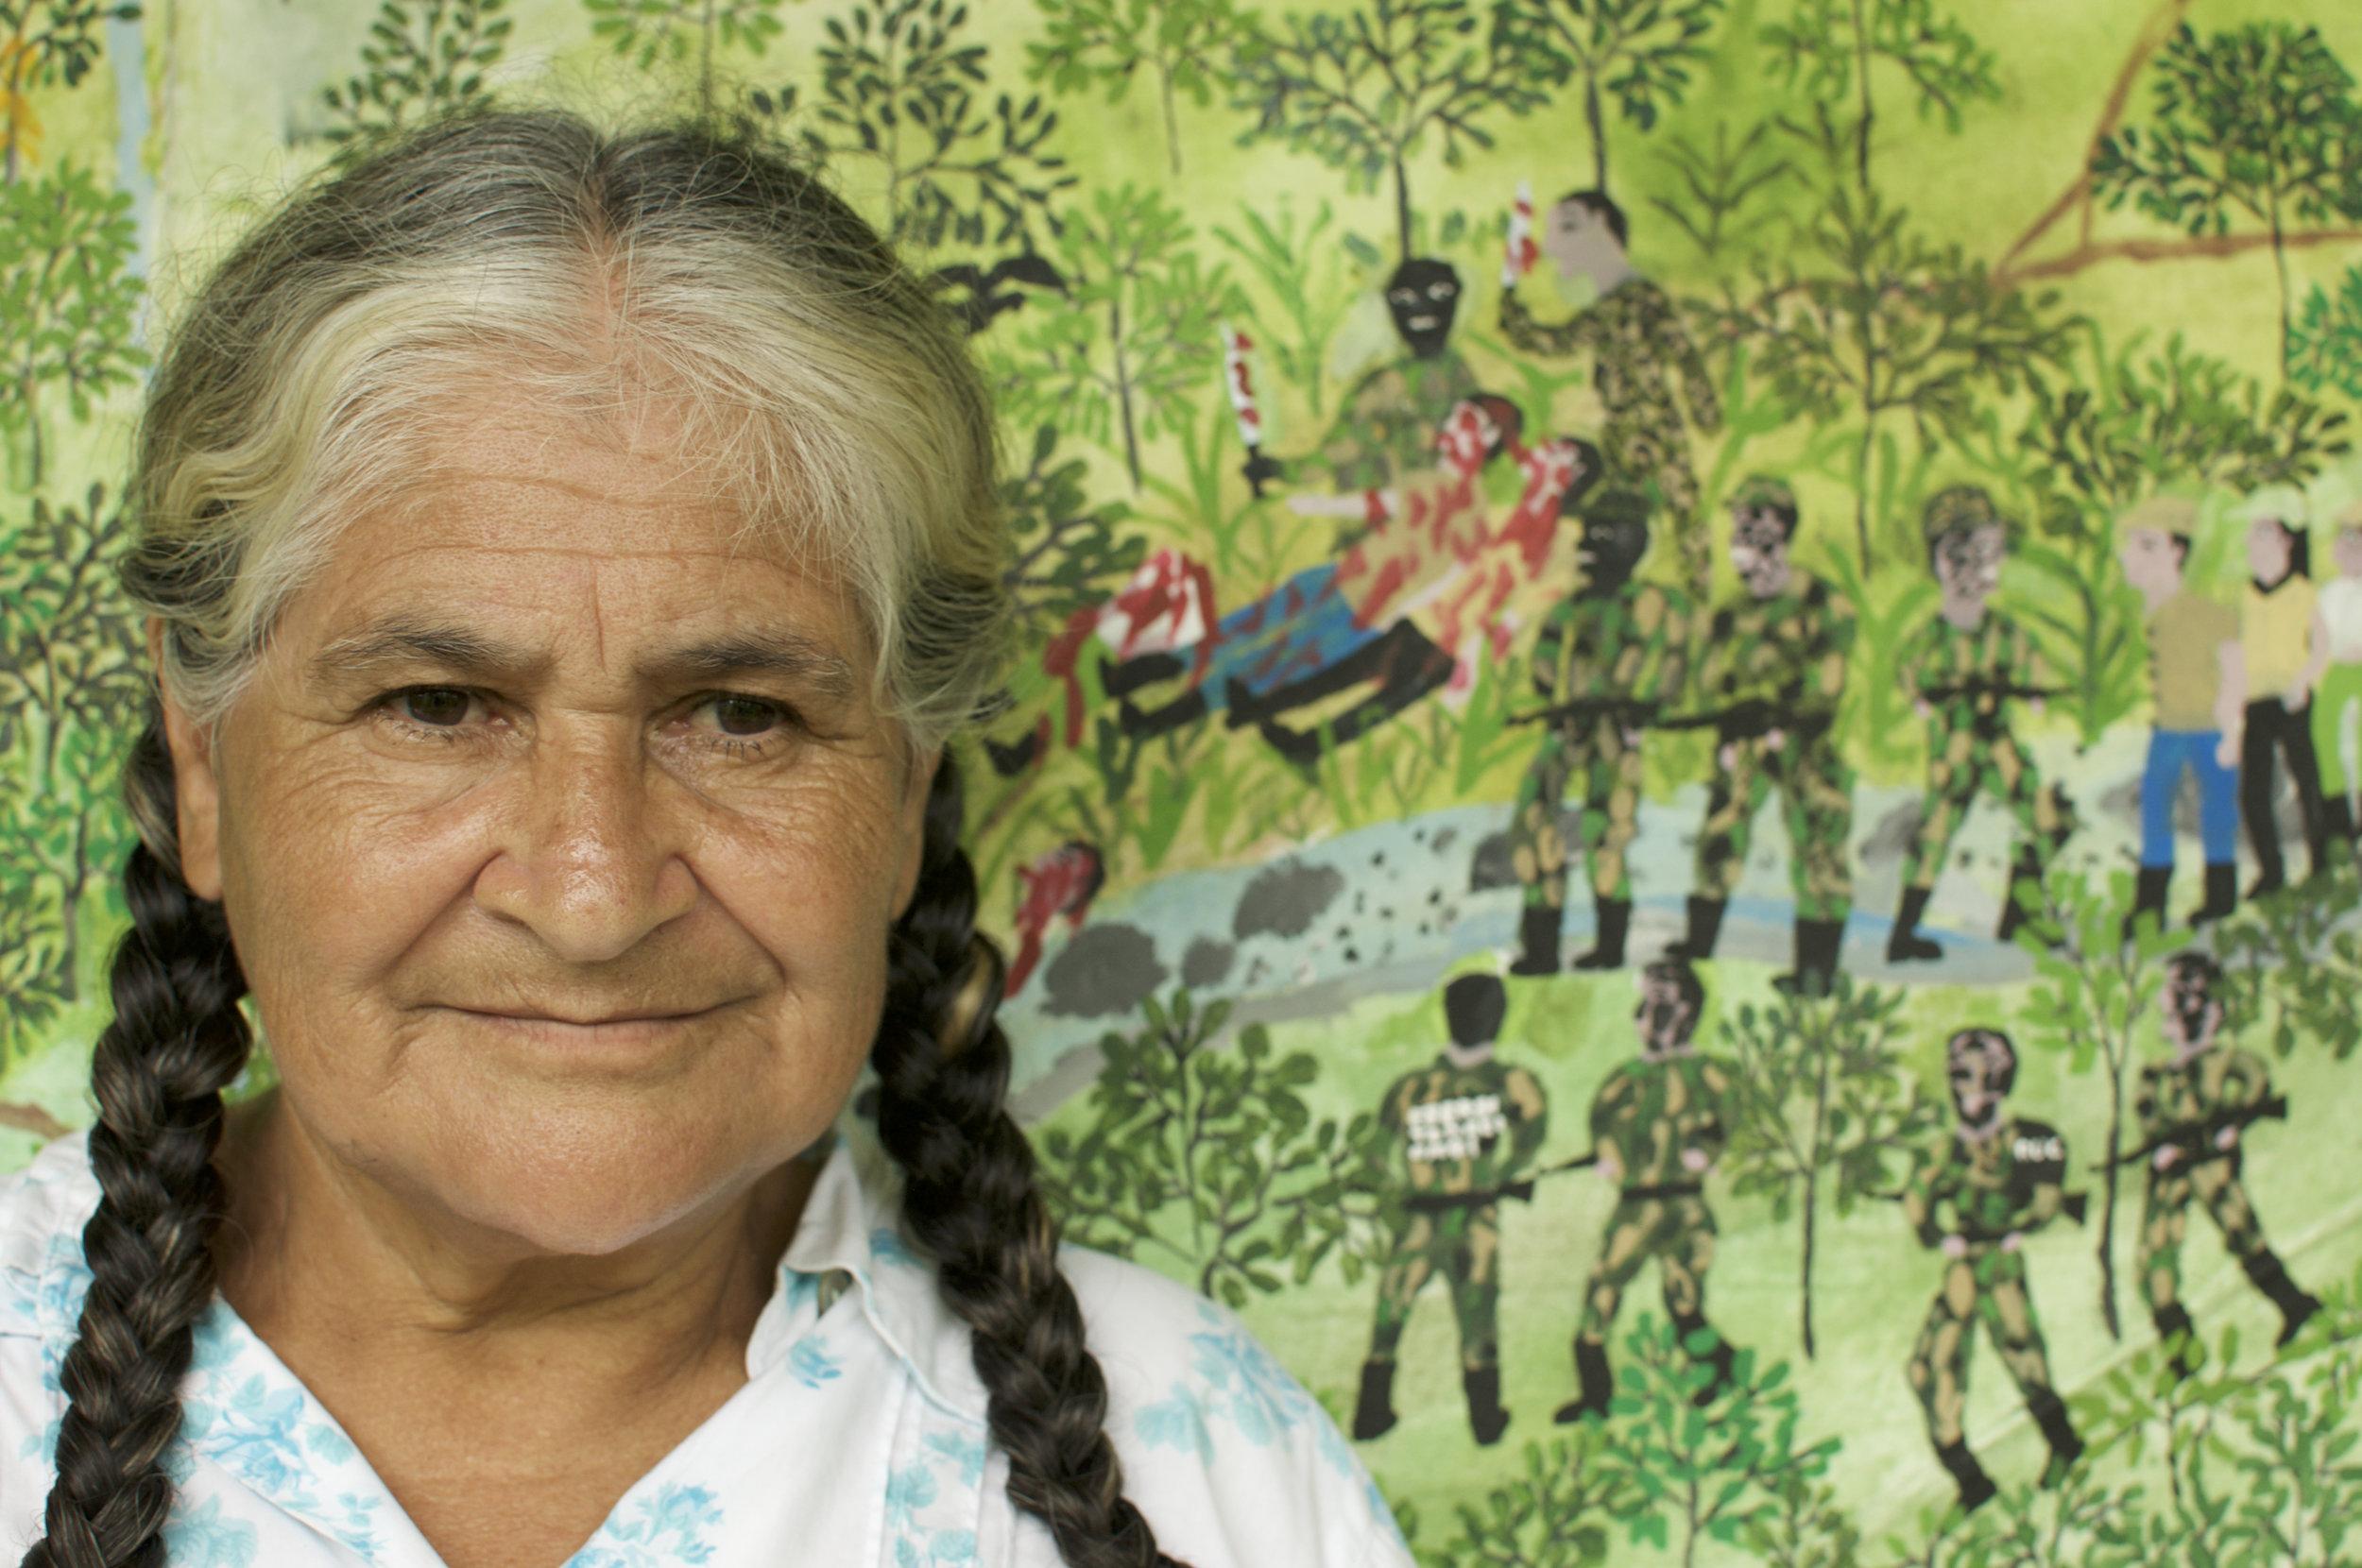 One of the protagonists of the film Doña Brígida González. Photo credit: Pablo Mejía Trujillo